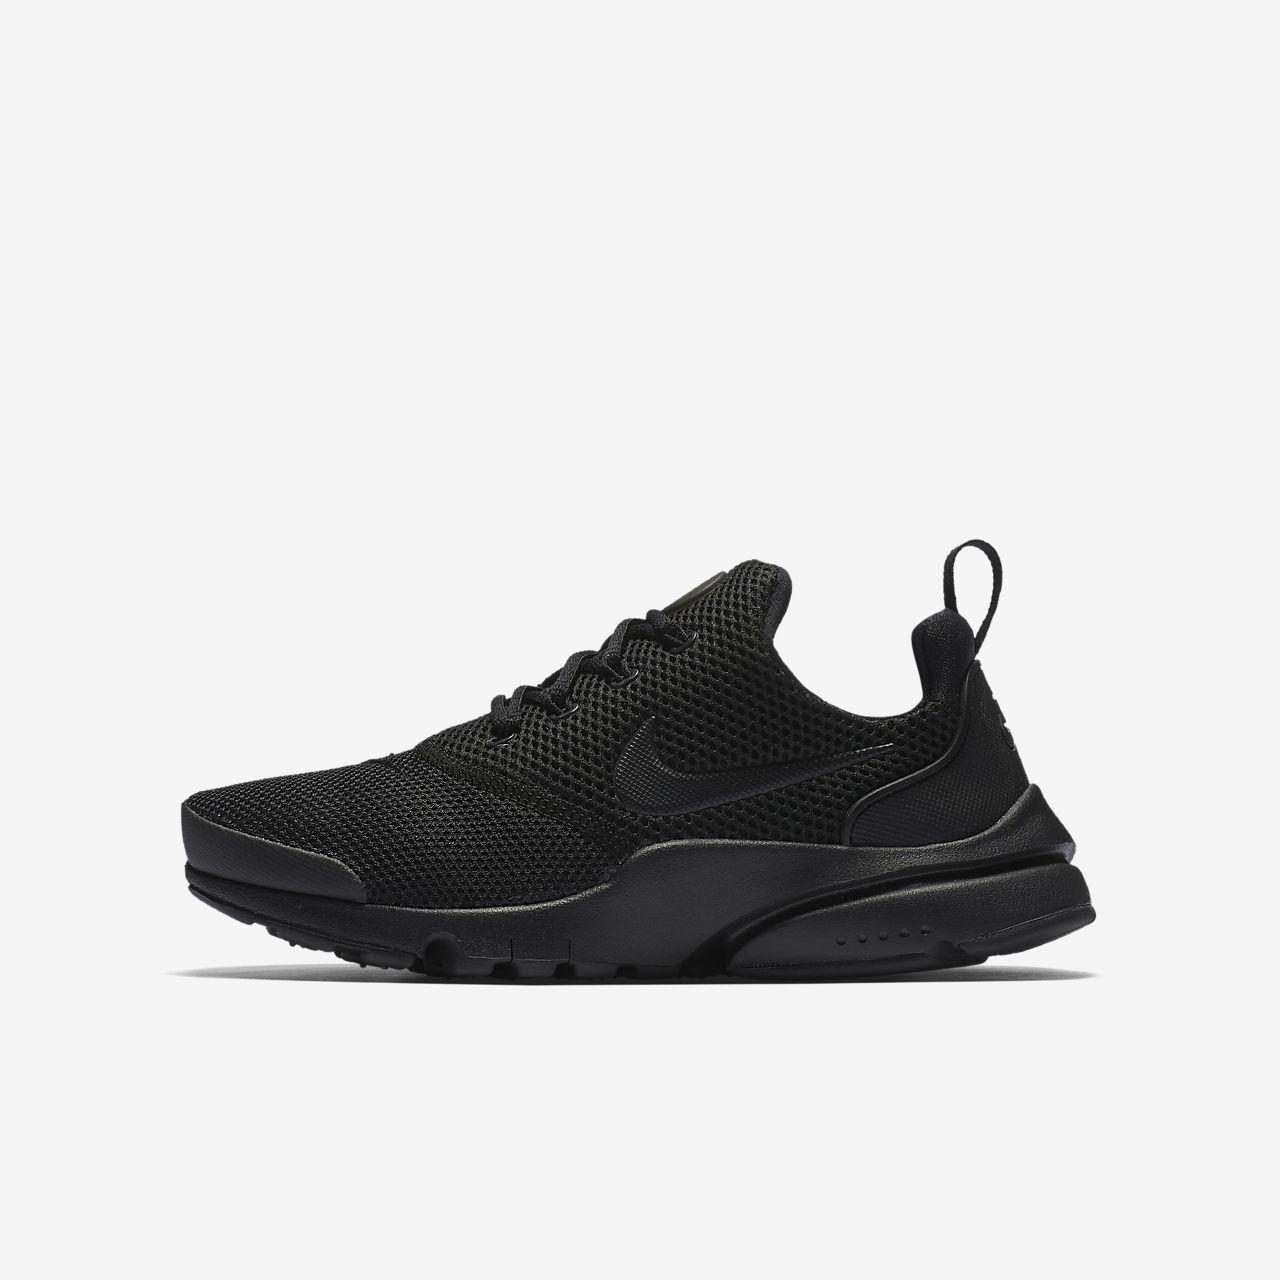 new concept 4cf7b 53e79 ... Nike Presto Fly Schuh für ältere Kinder